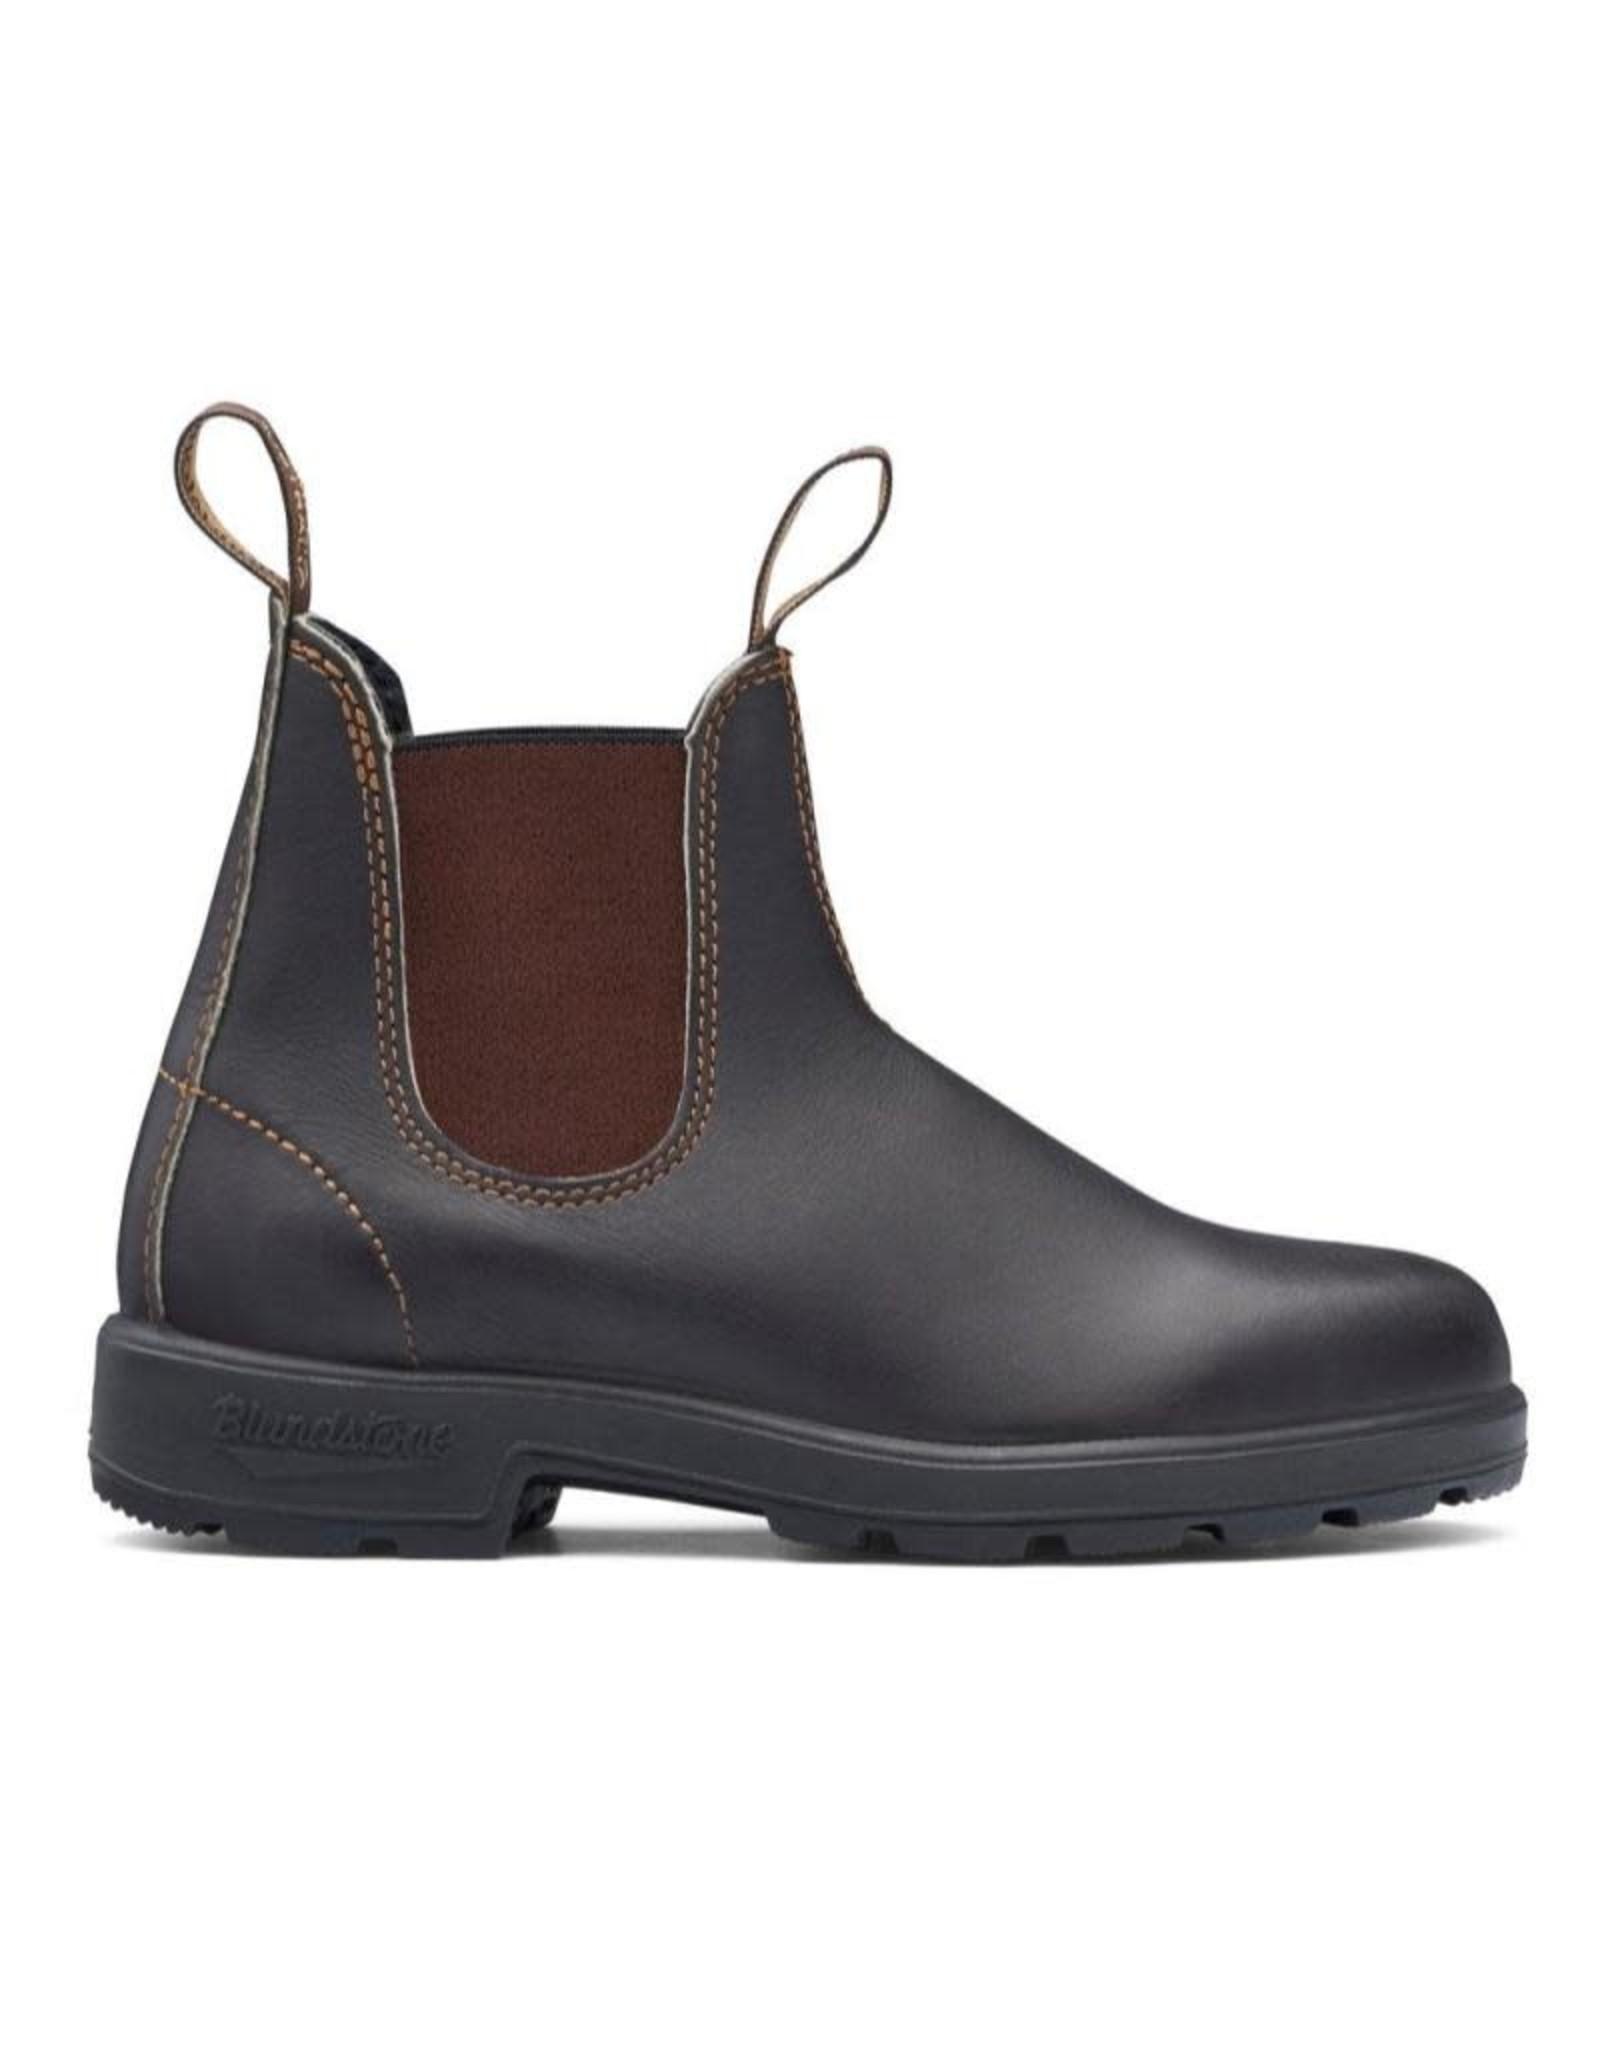 BLUNDSTONE Original 500 Boots